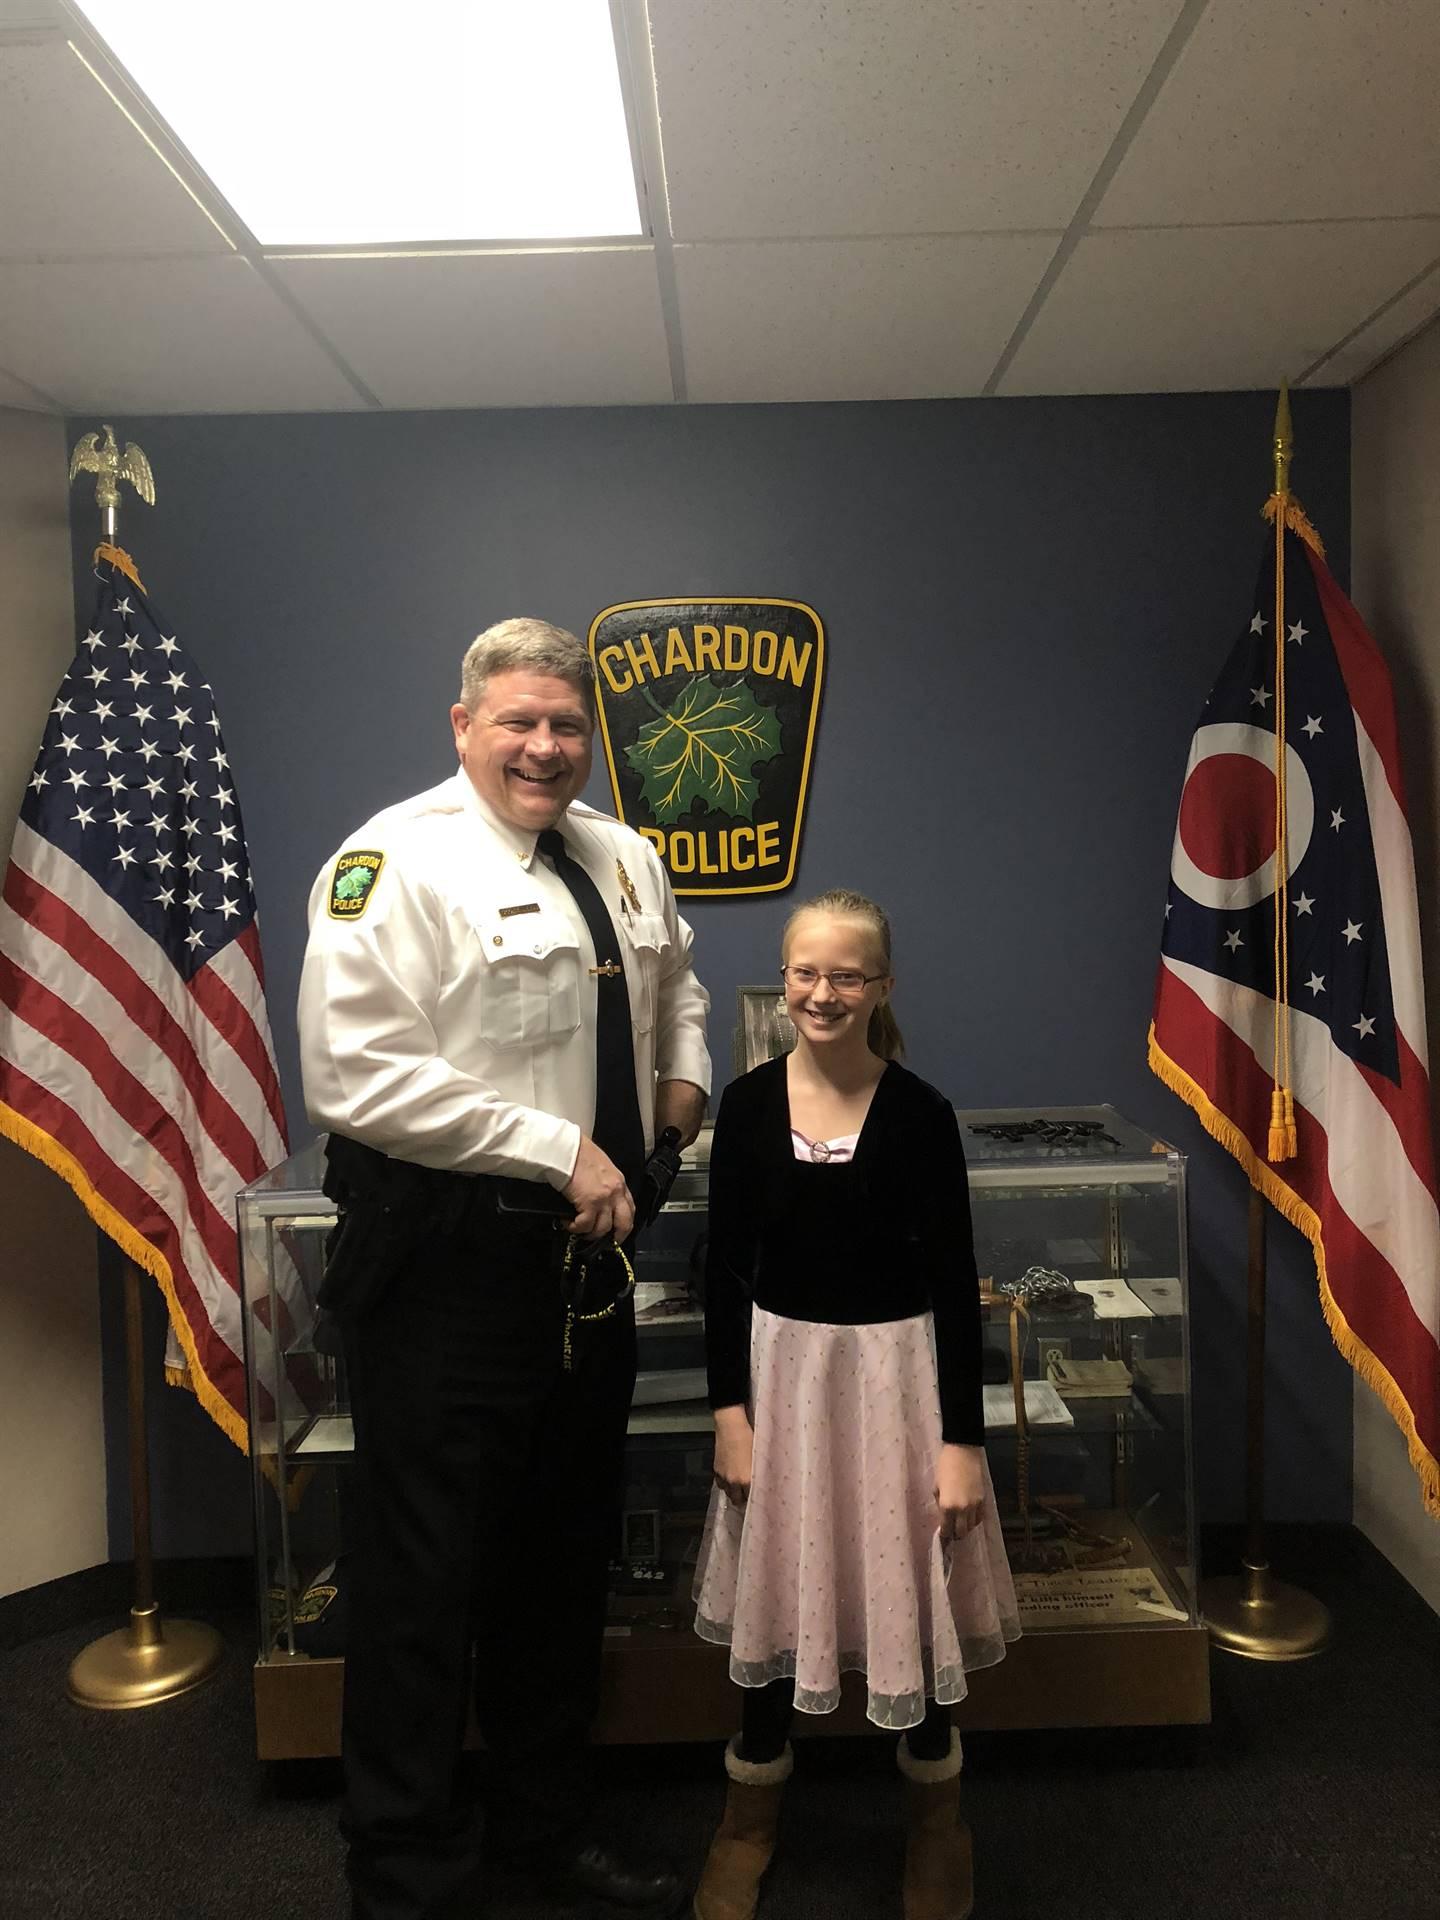 Mackenzie meeting the Chardon Chief of Police